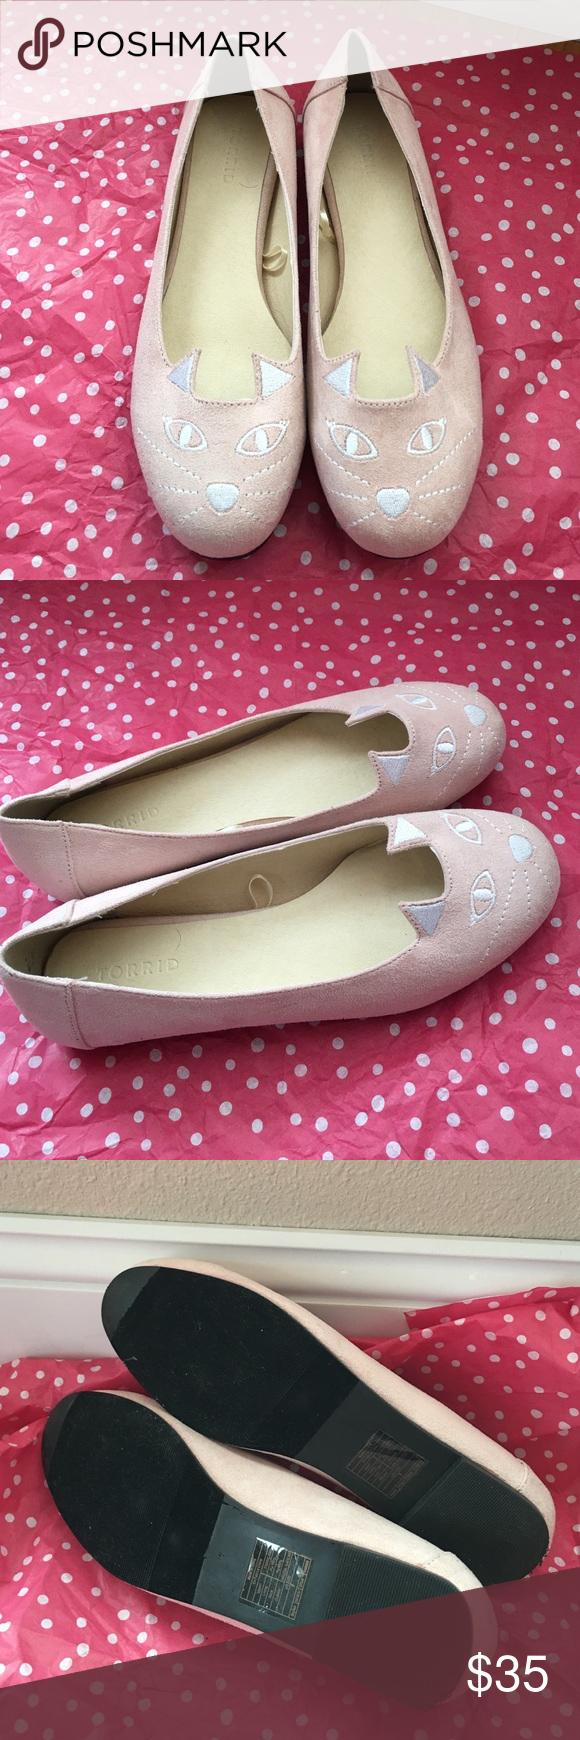 Crazy Adorable Torrid Cat Flats So crazy cute!! Brand new! Never worn! torrid Shoes Flats & Loafers